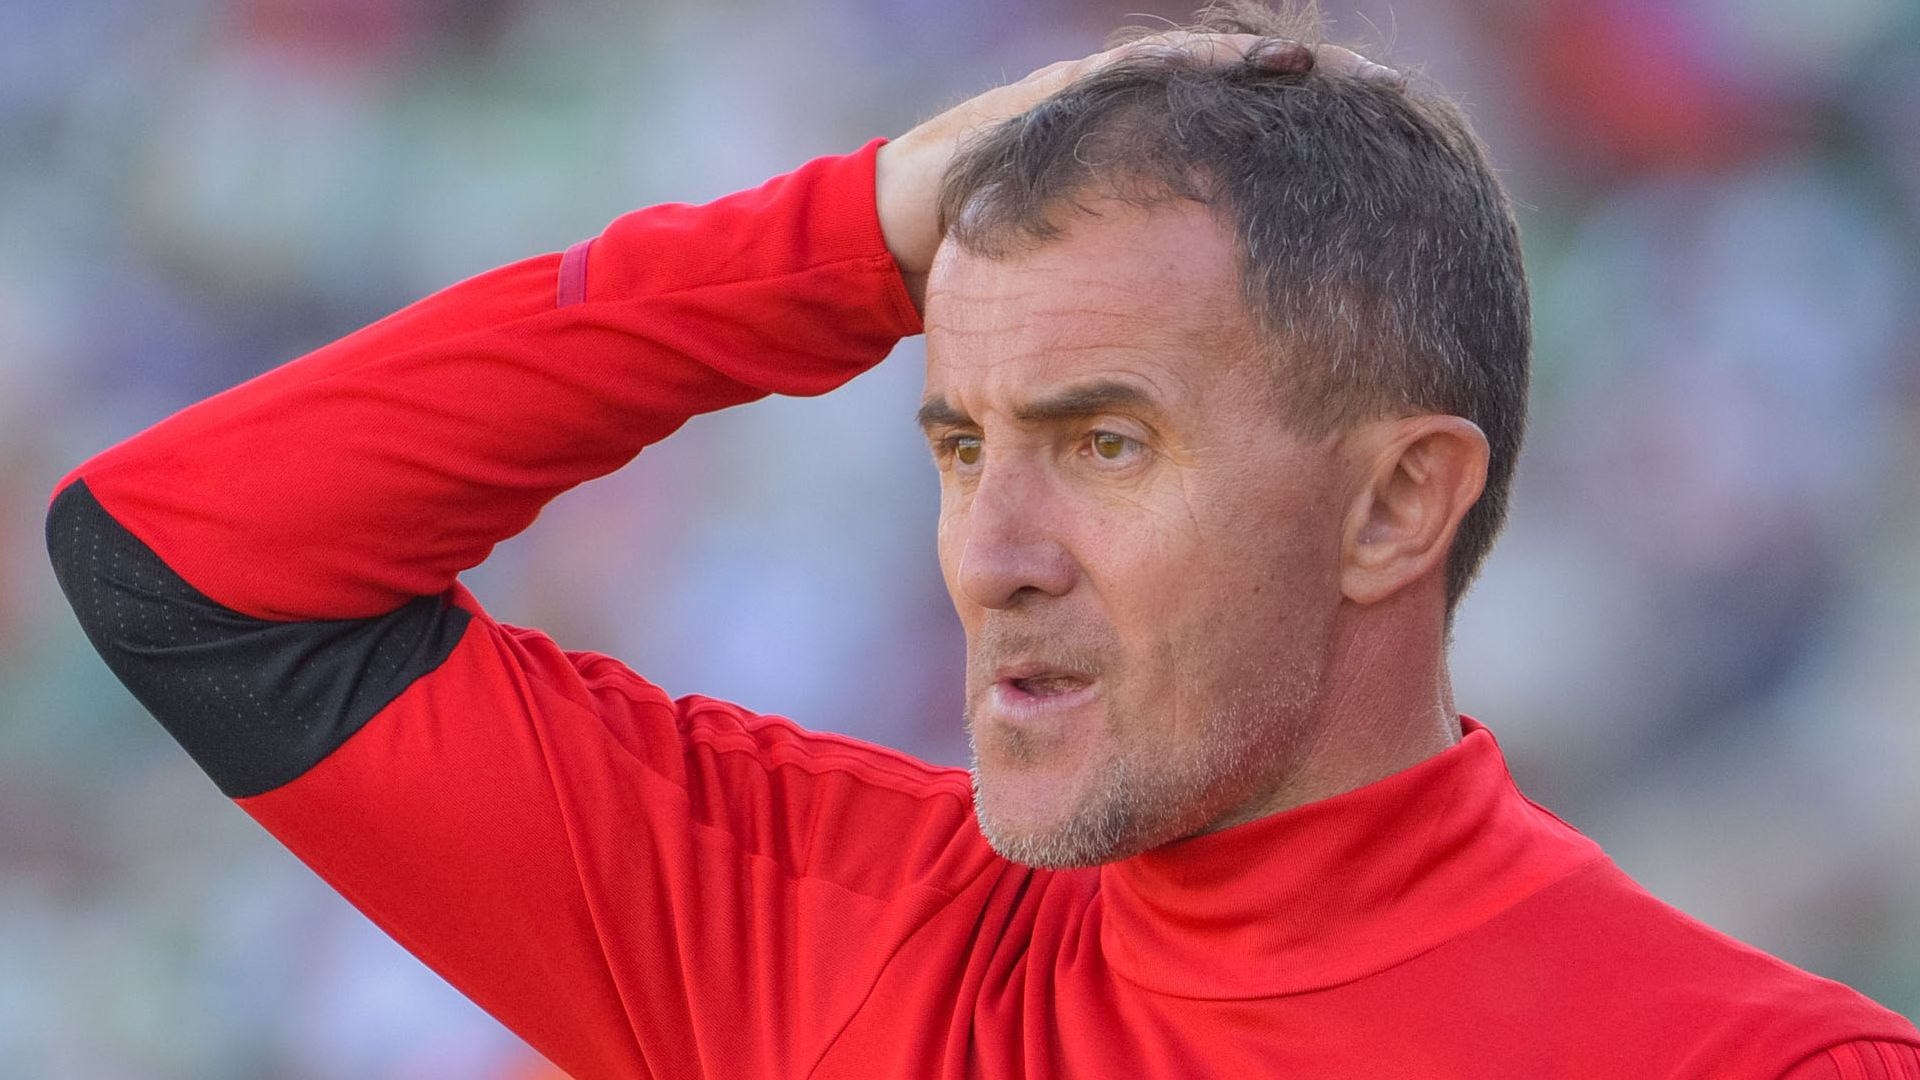 Micho Sredojevic: Ex-Orlando Pirates coach falls short of second trophy with Zamalek